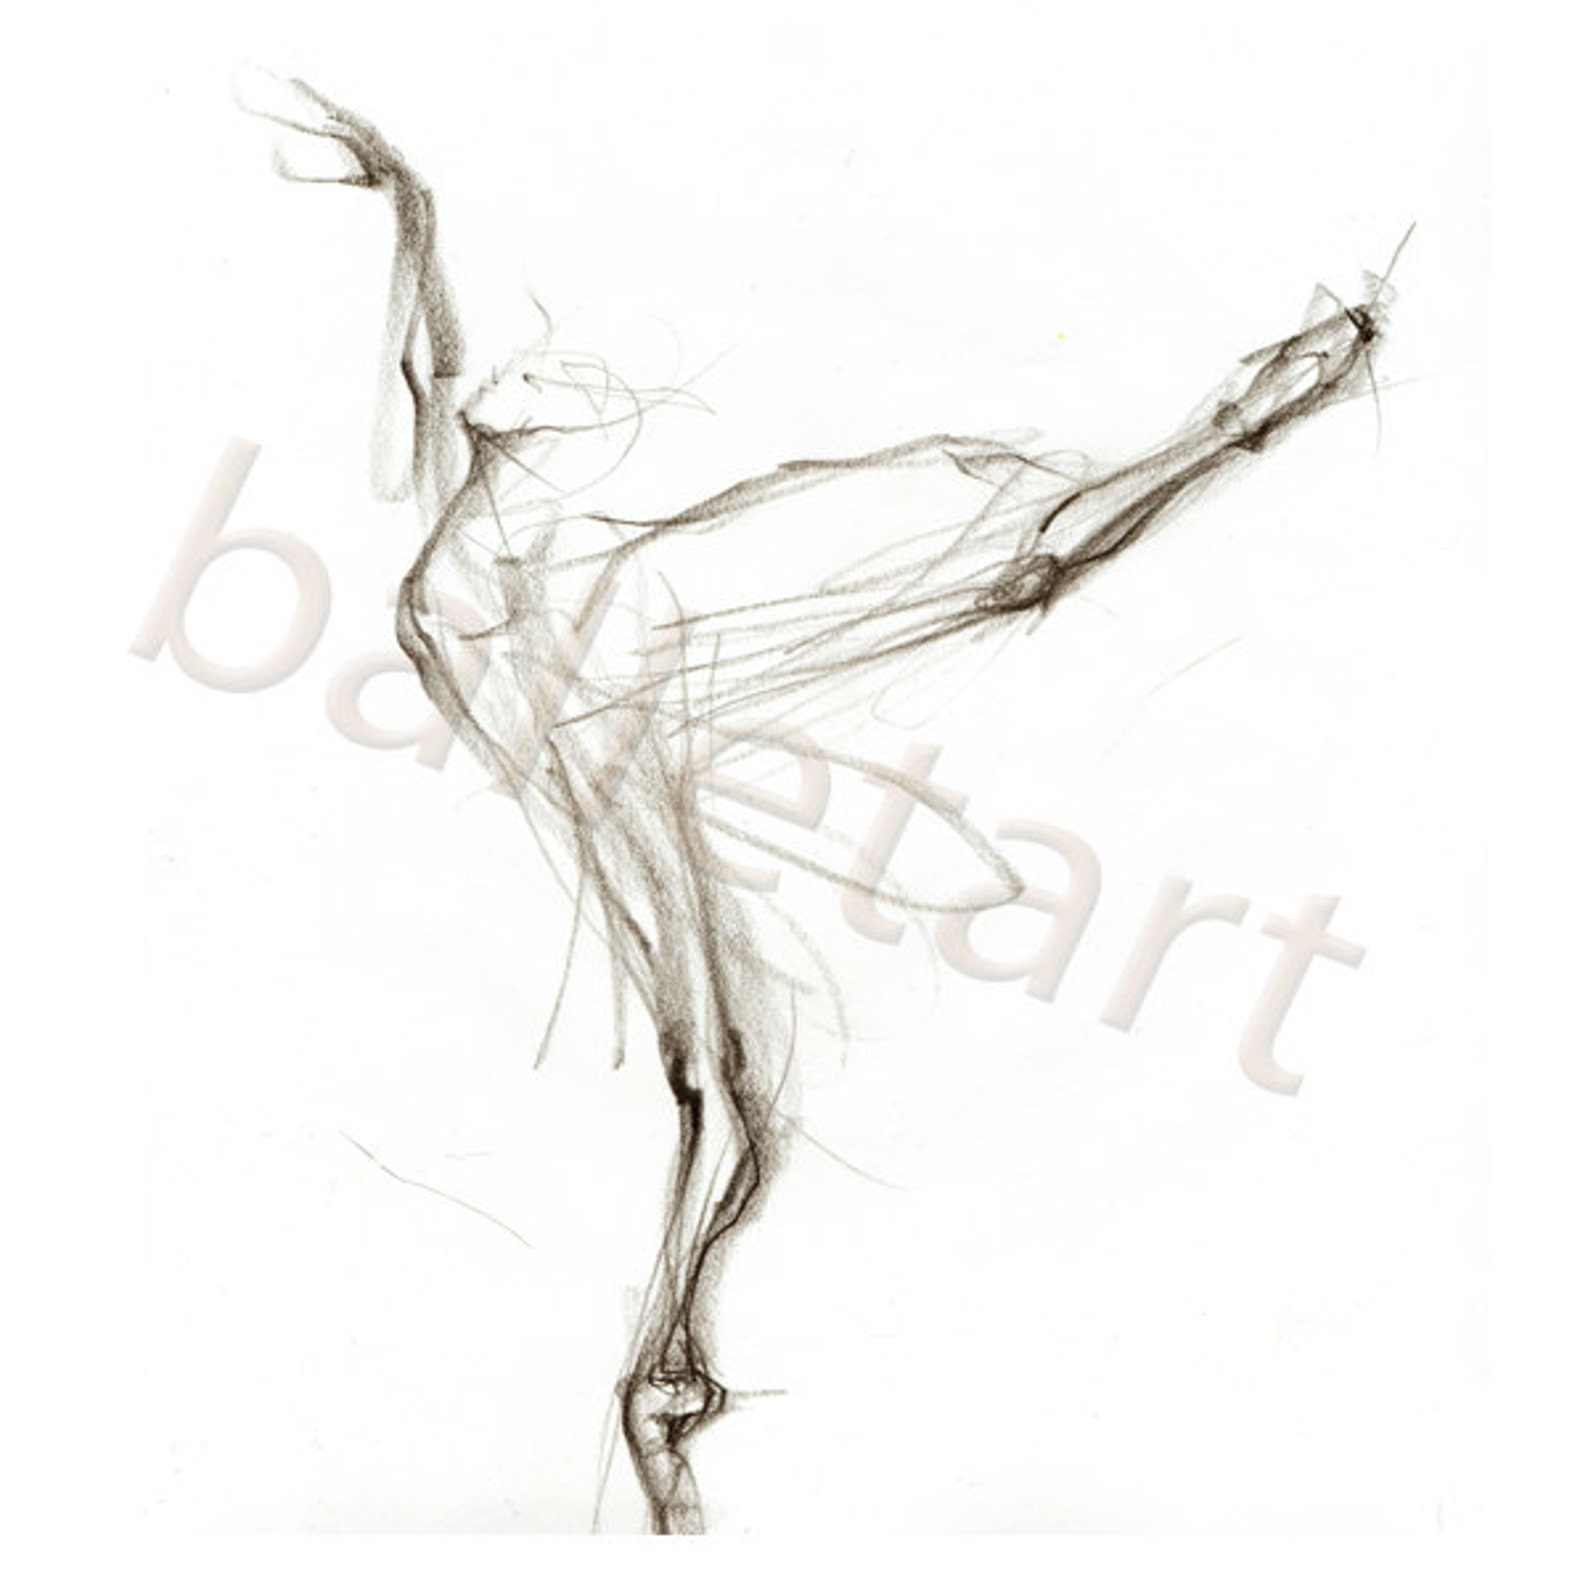 black and white arabesque, ballet art, art print, pencil drawing, dance wall art, ballerina gift, interior design, artwork, gift